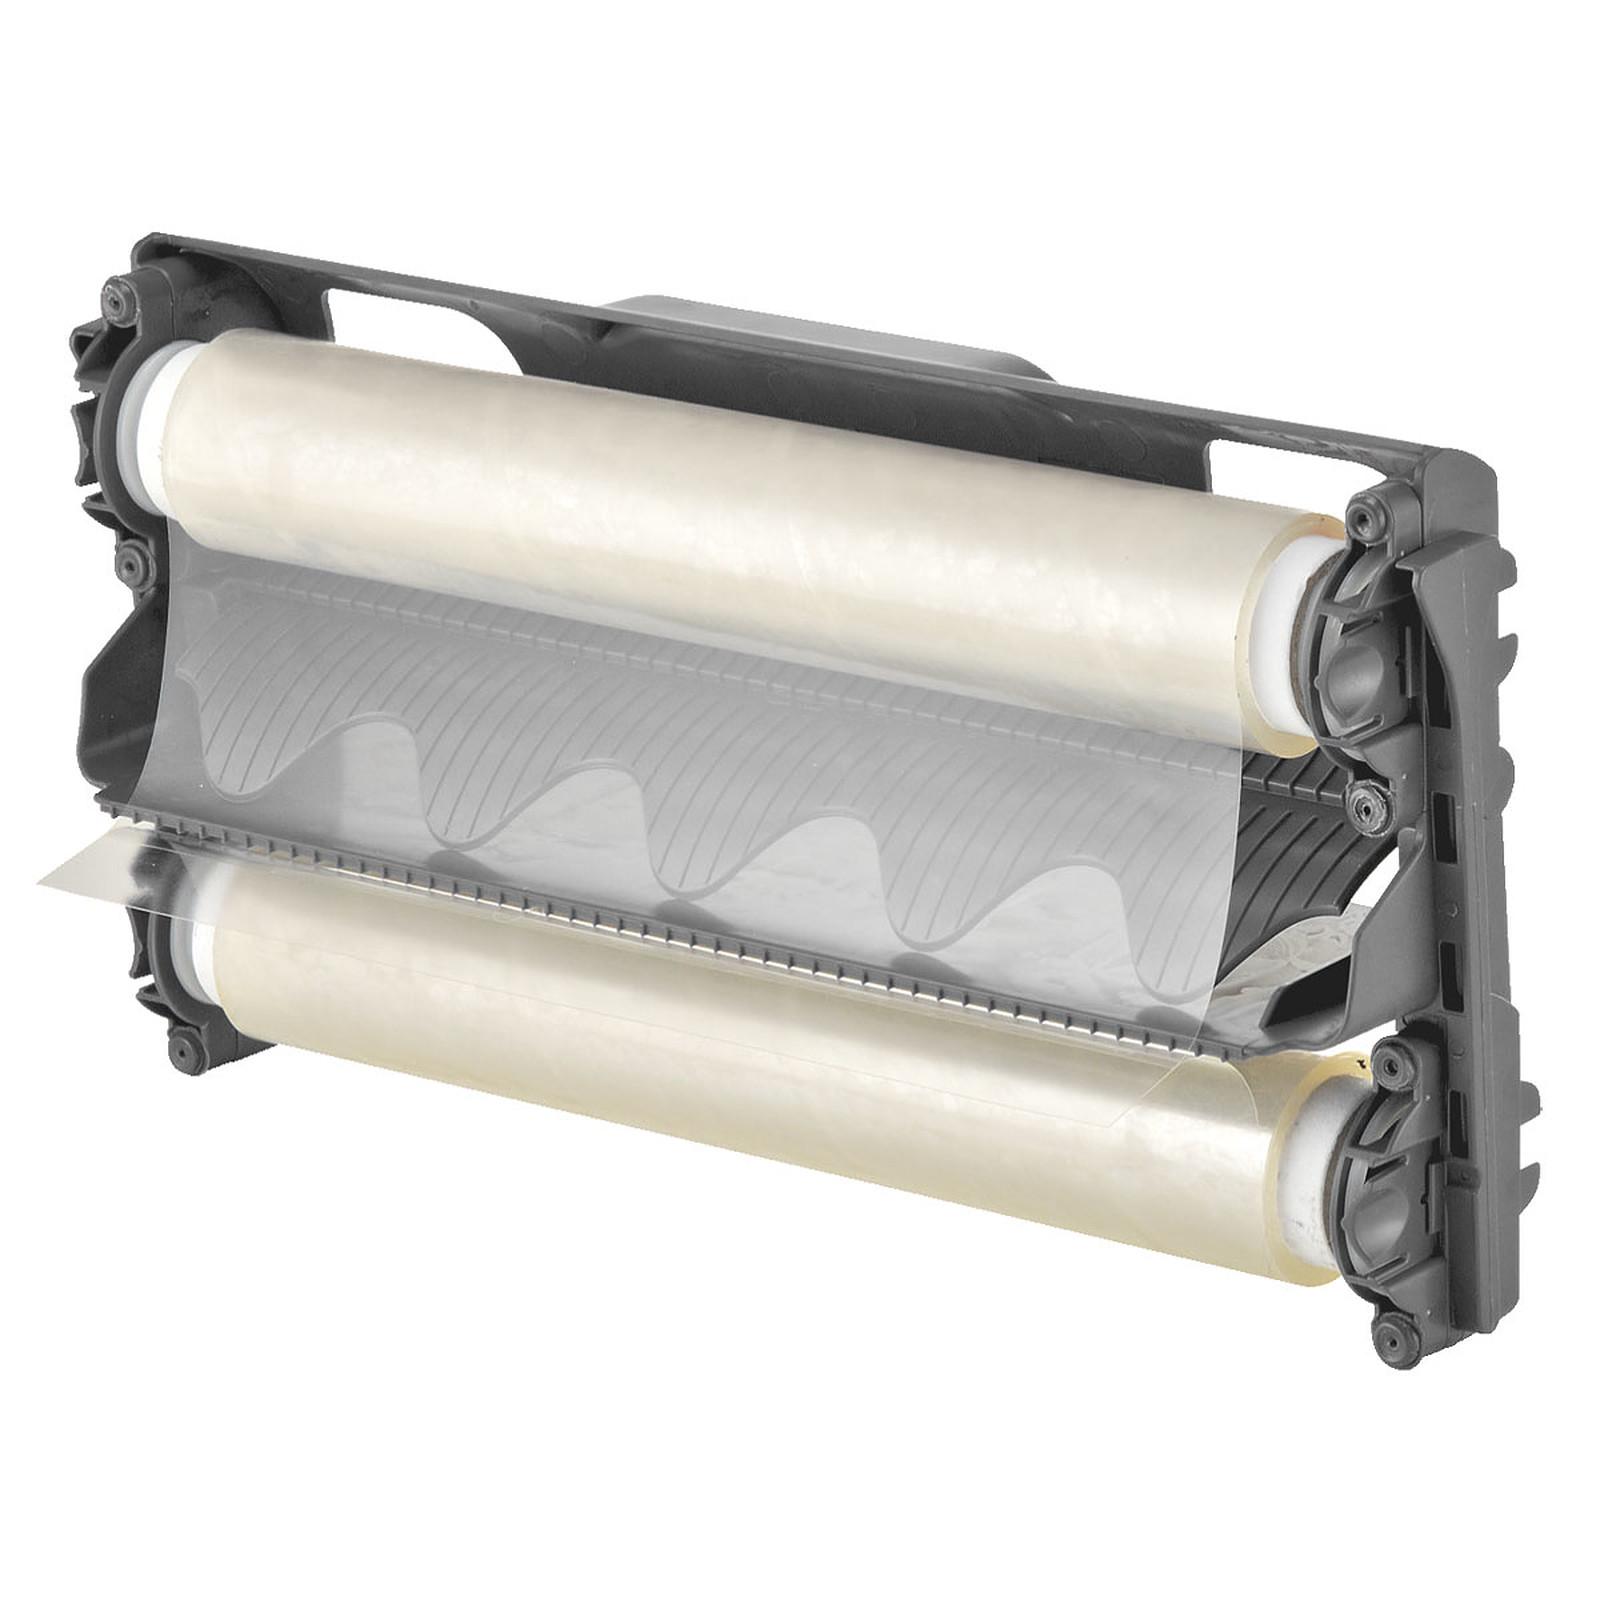 Leitz Cartouche de recharge CS9 - 20 m